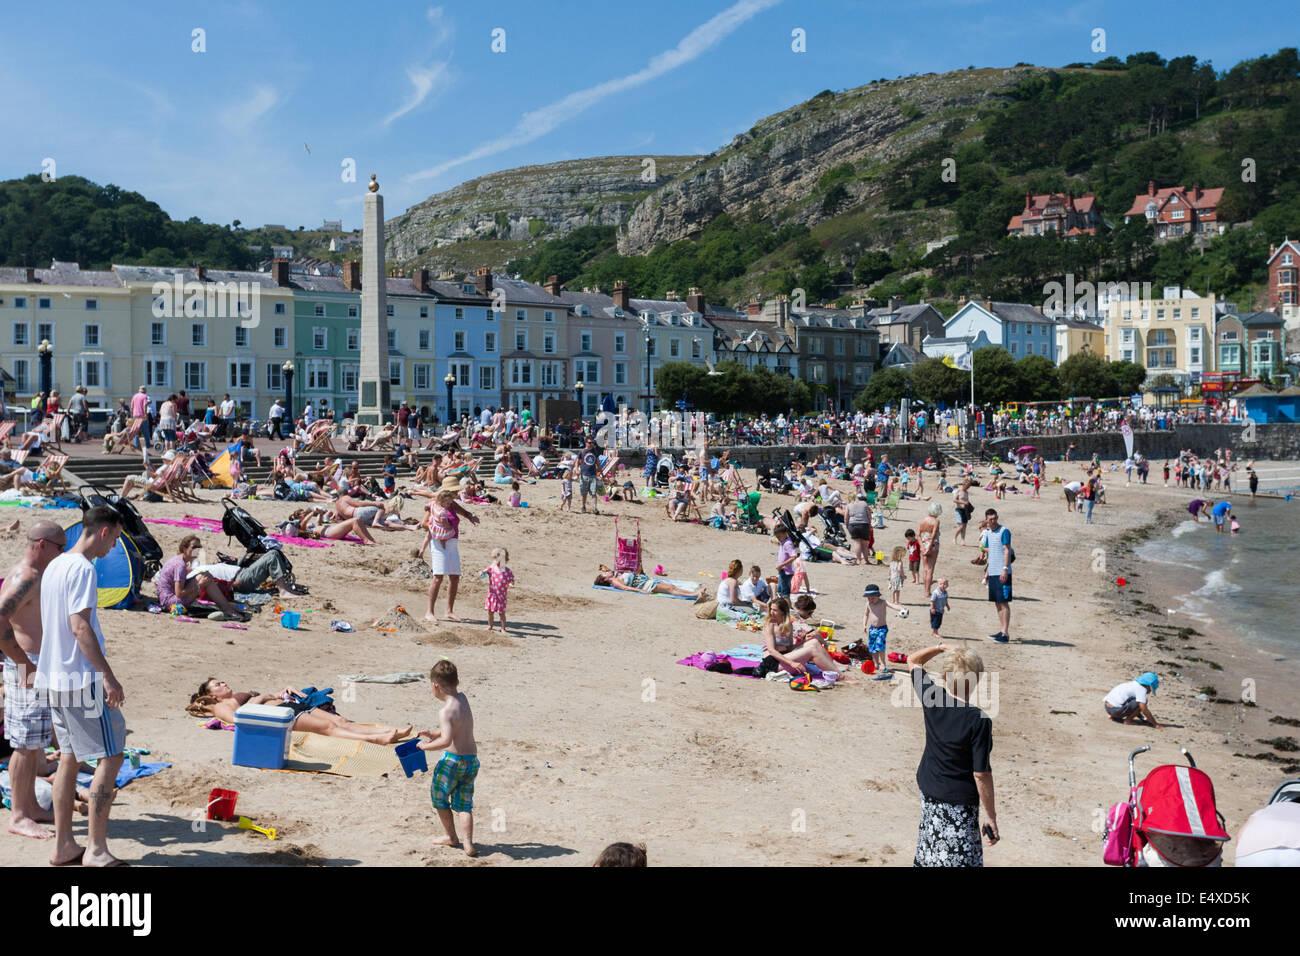 North Wales, UK. 17th July, 2014. Hundreds have chosen Llandudno beach on coast of north Wales to enjoy the hot - Stock Image